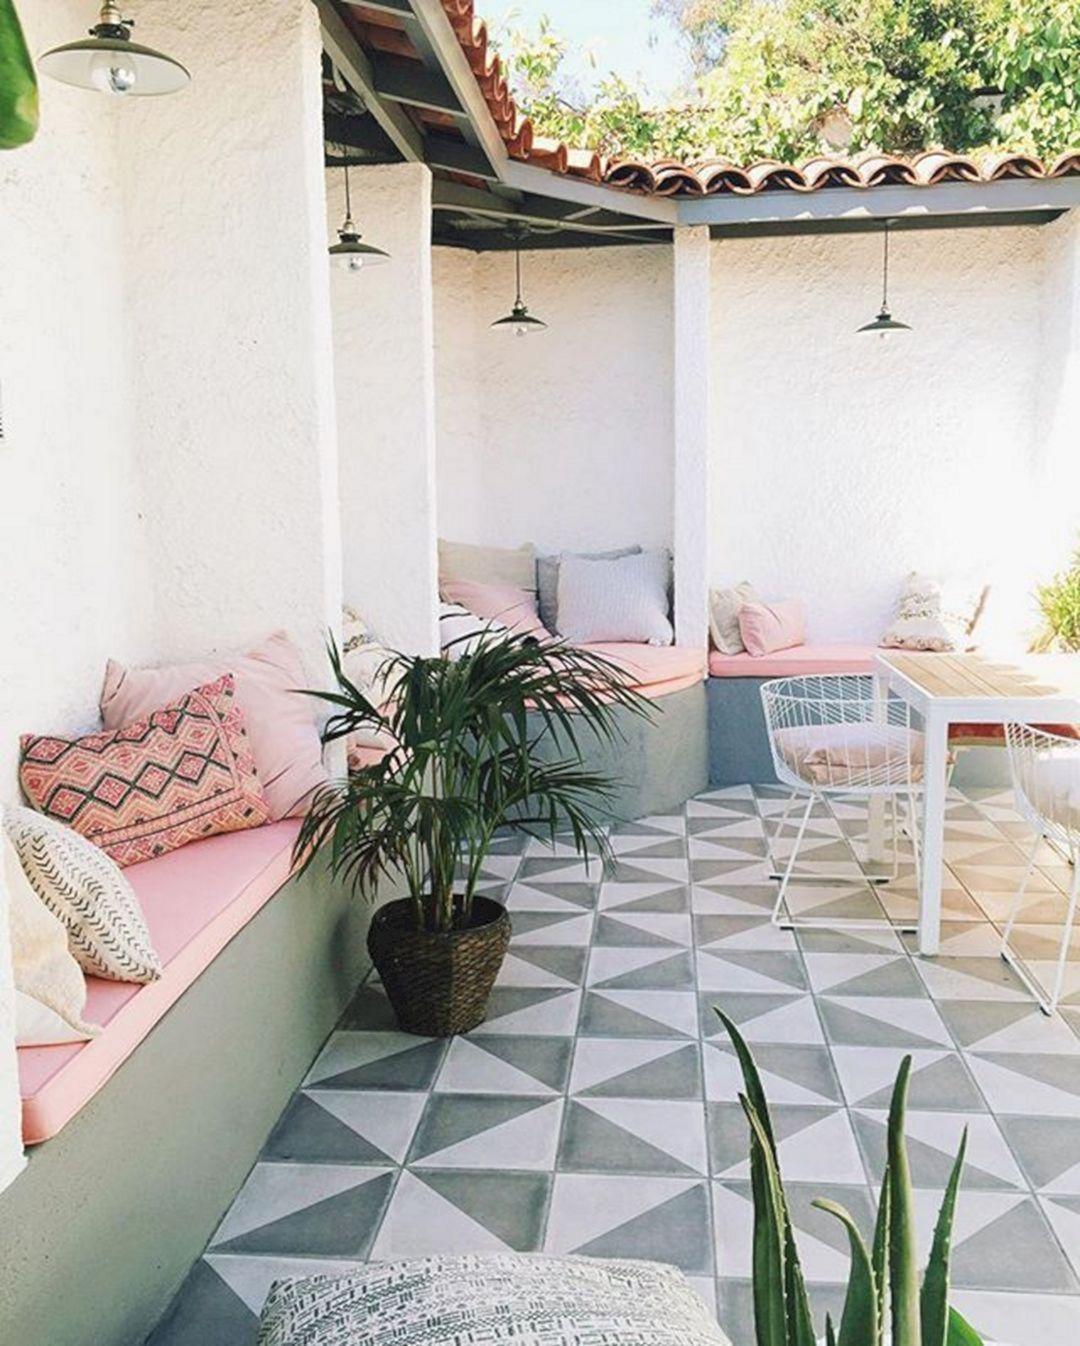 33 Gorgeous Bohemian Outdoor Patio Designs For Cozy Outdoor Space Idea – DEXORATE